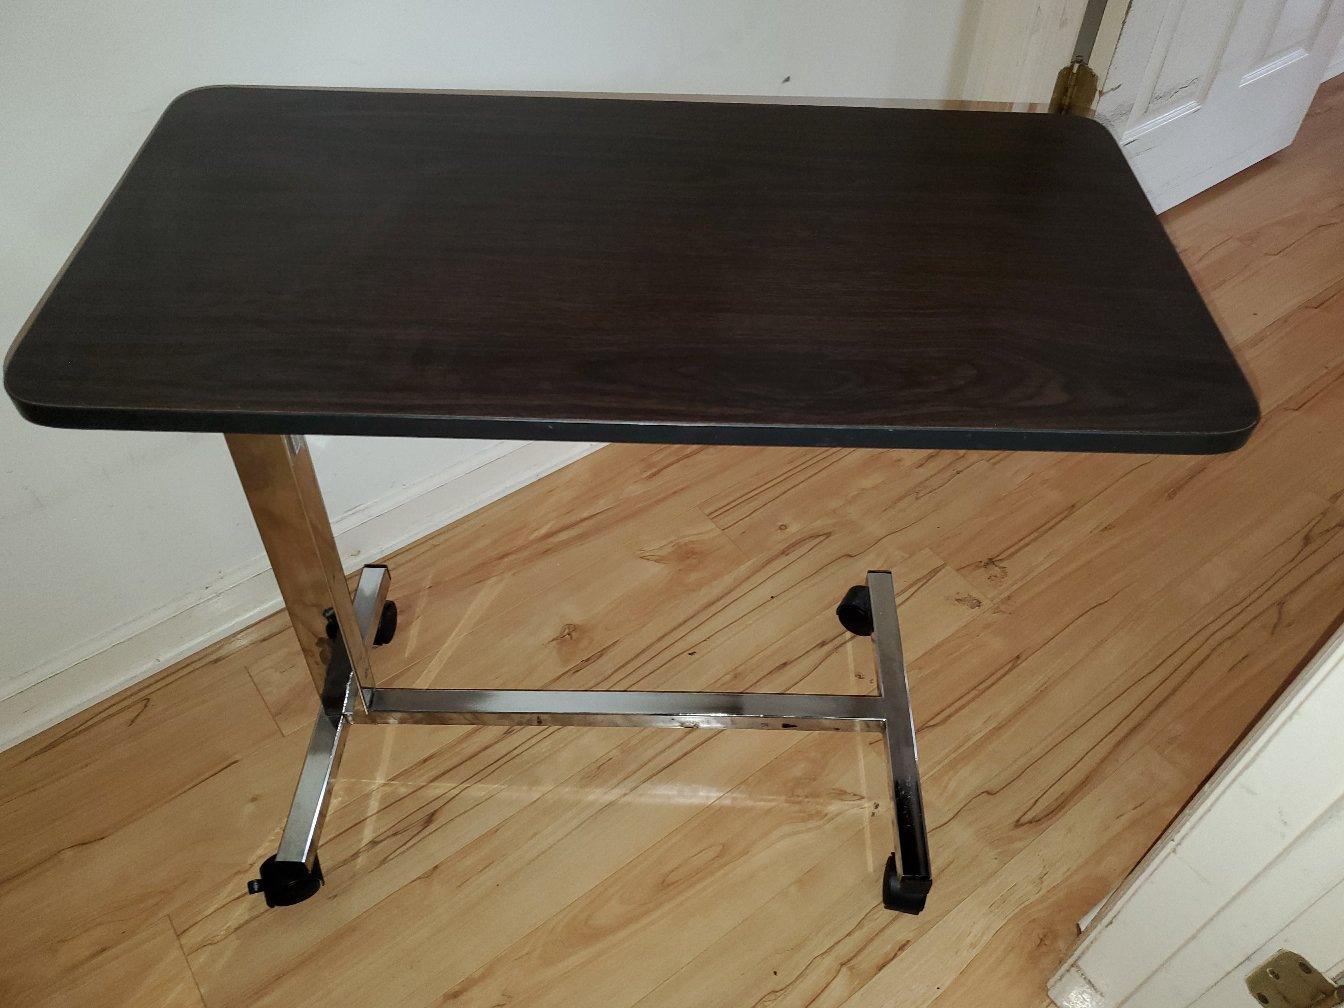 Photo 1 of adjustable hospital bedside table on wheels